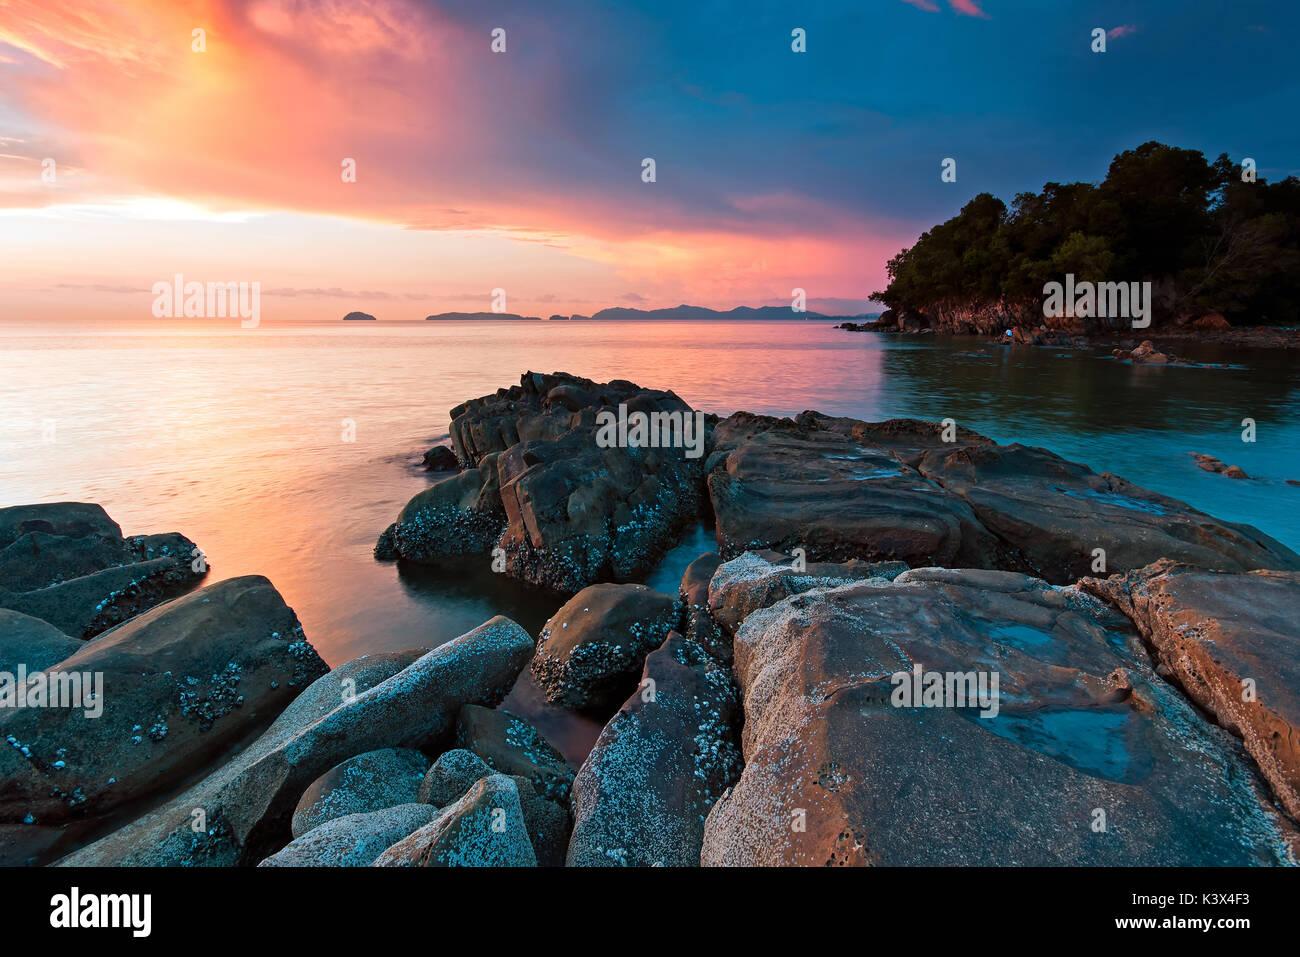 Dramatic sky during sunset in Kota Kinabalu beach, Tanjung Lipat in Sabah Borneo, Malaysia. - Stock Image